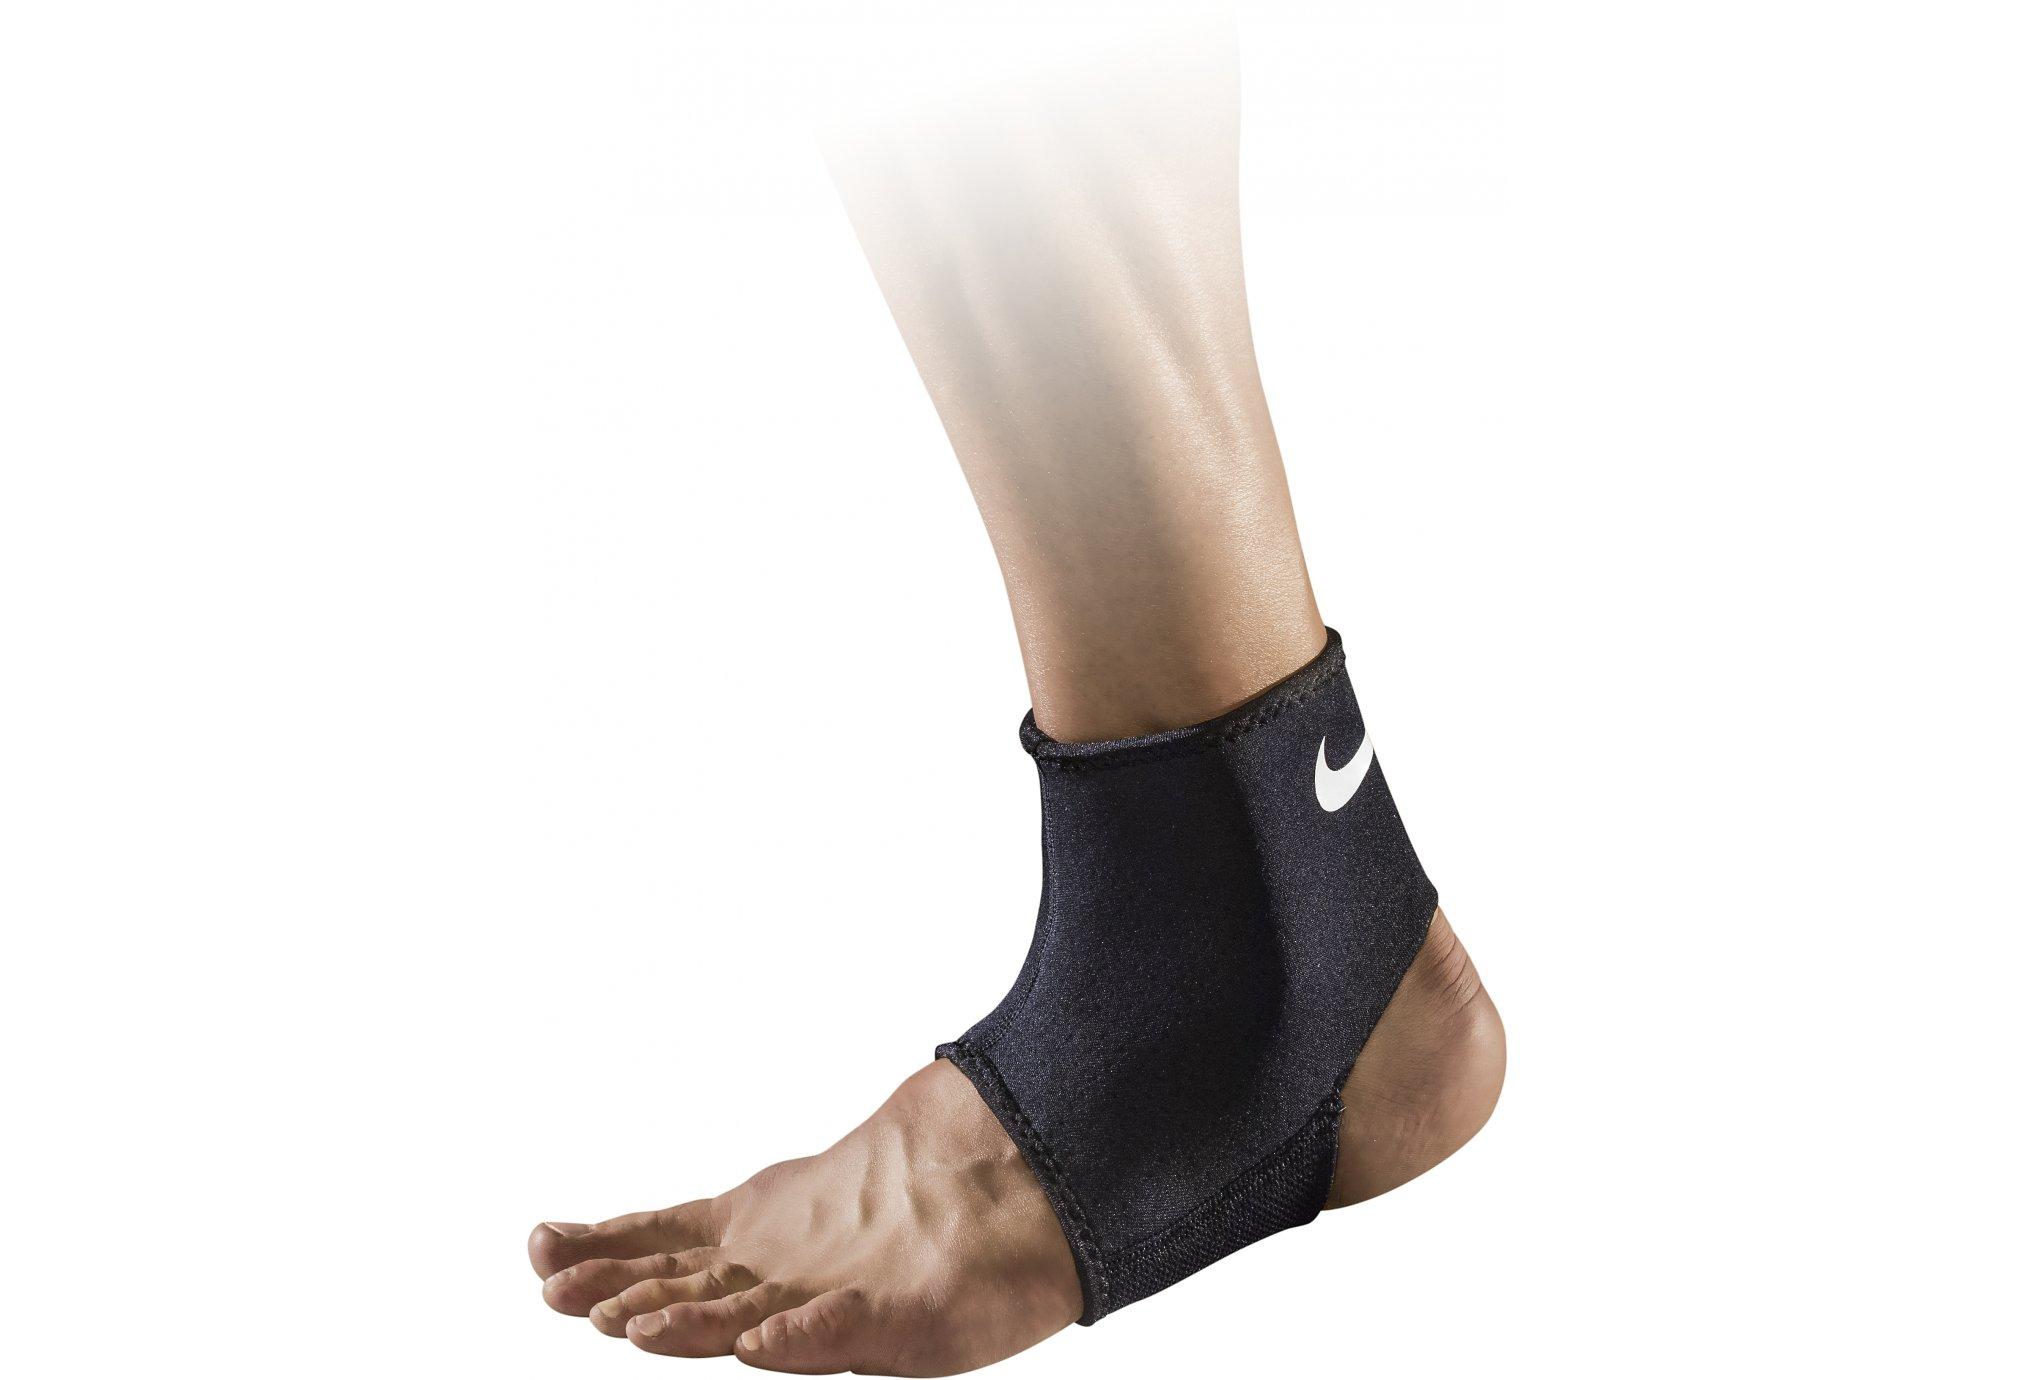 Nike Chevillère de Combat Nike Pro 2.0 Protection musculaire & articulaire